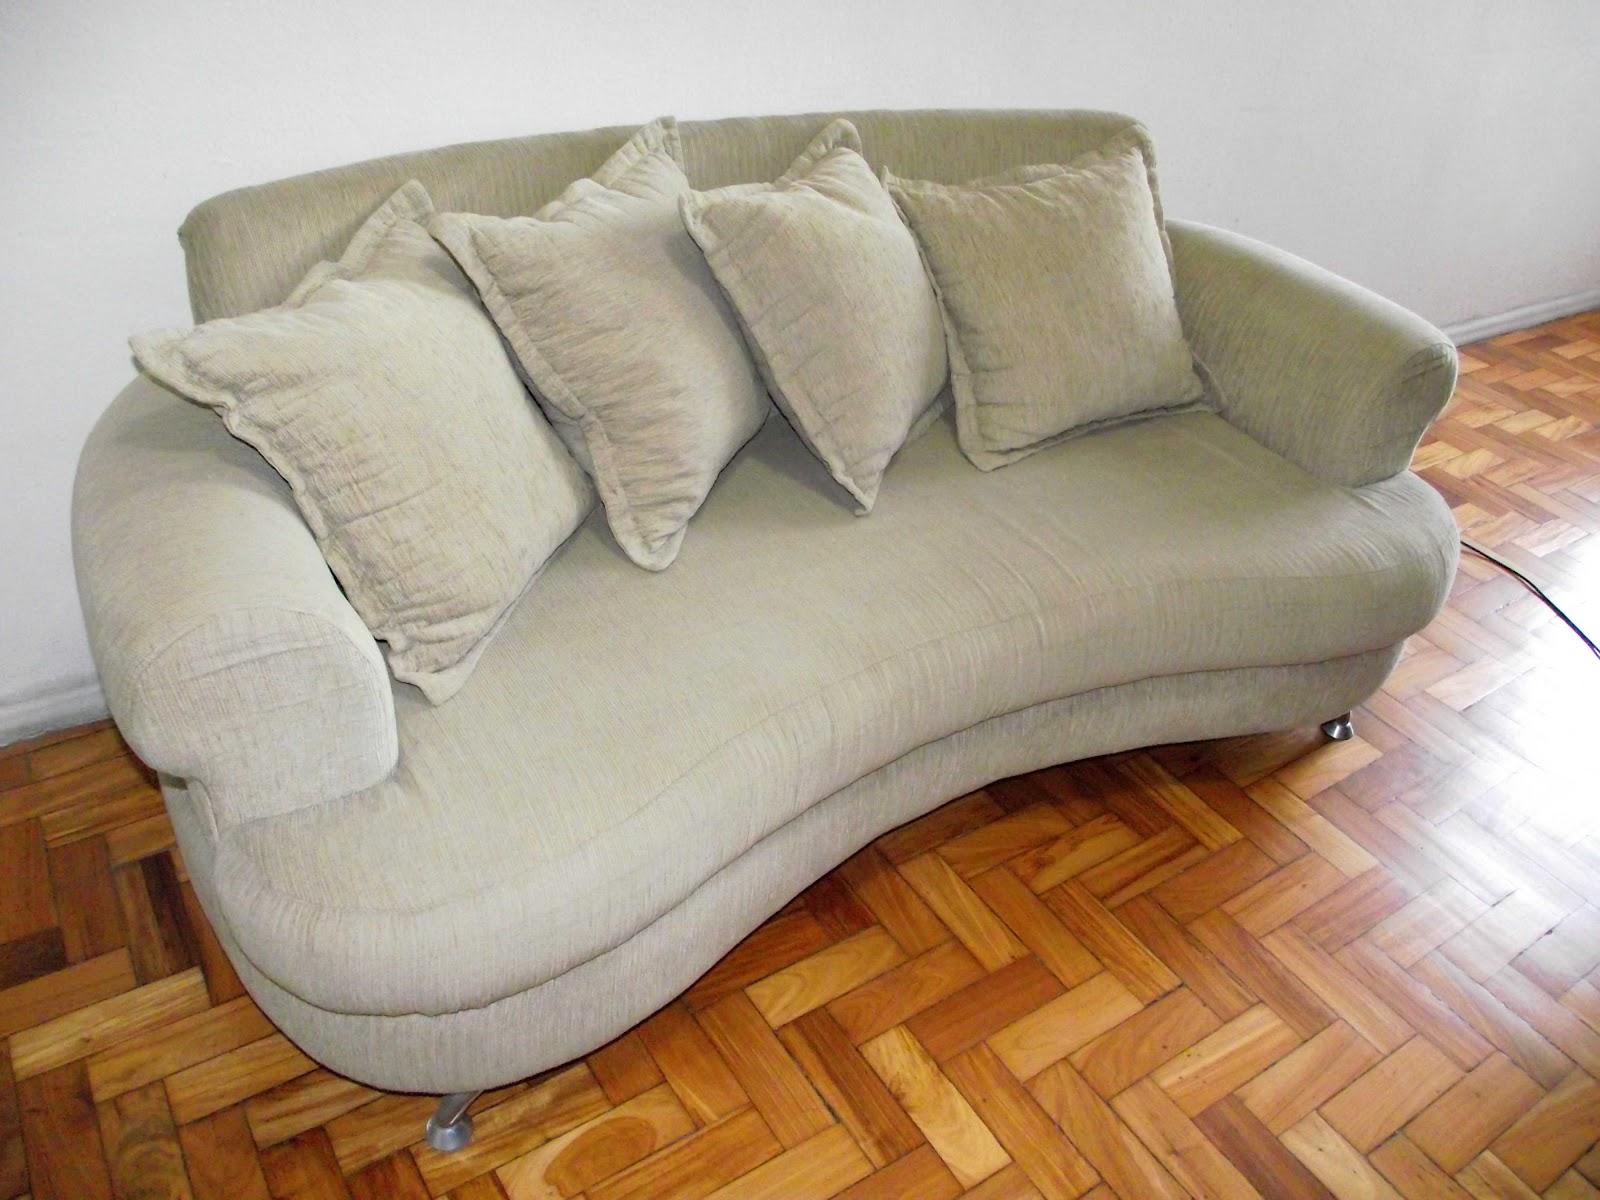 Vendo Sofa Divatto Modelo Florencia Prestamos Sin Aval